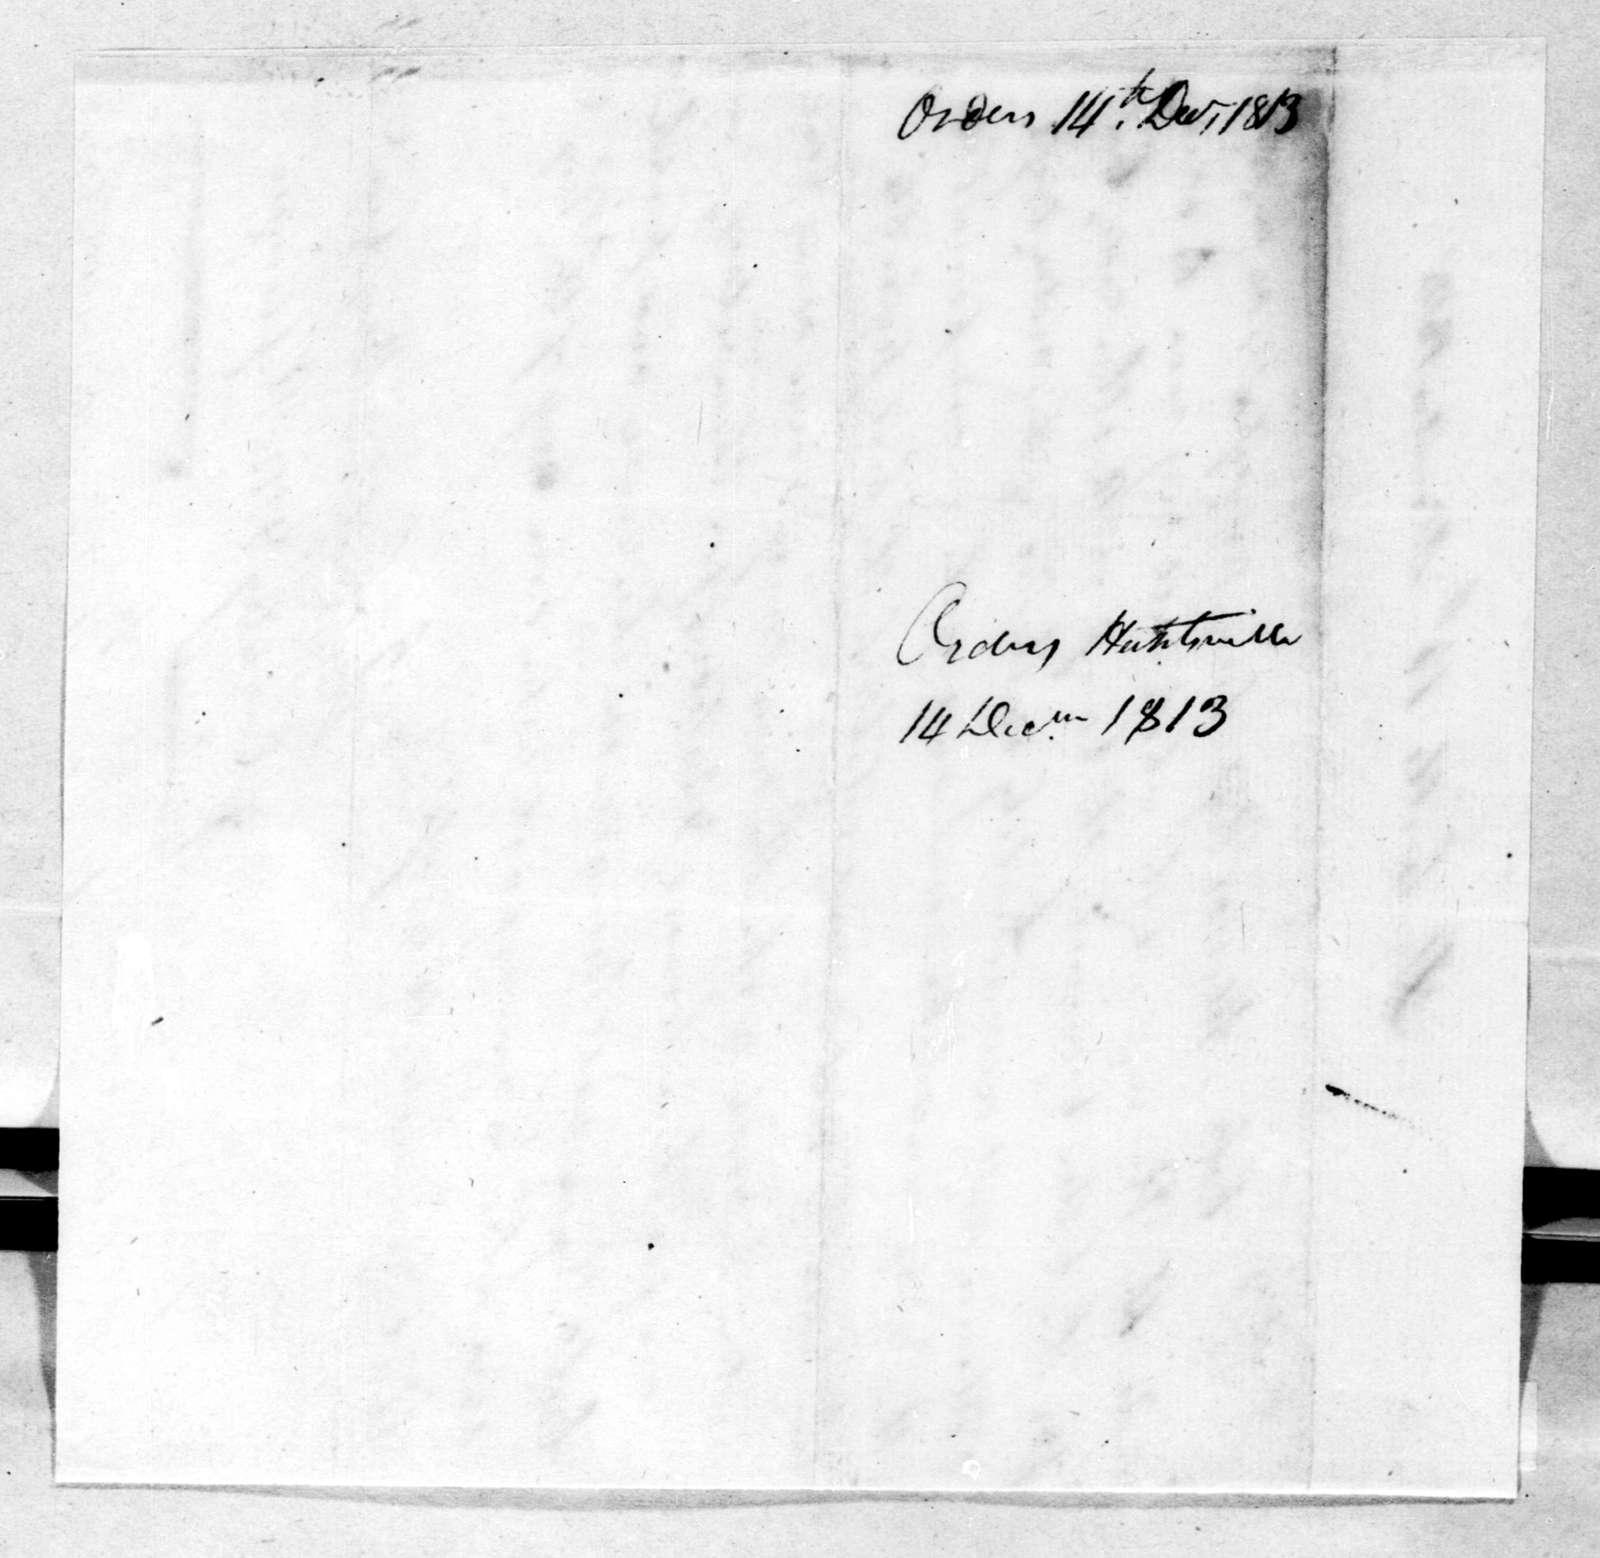 John Coffee, December 14, 1813